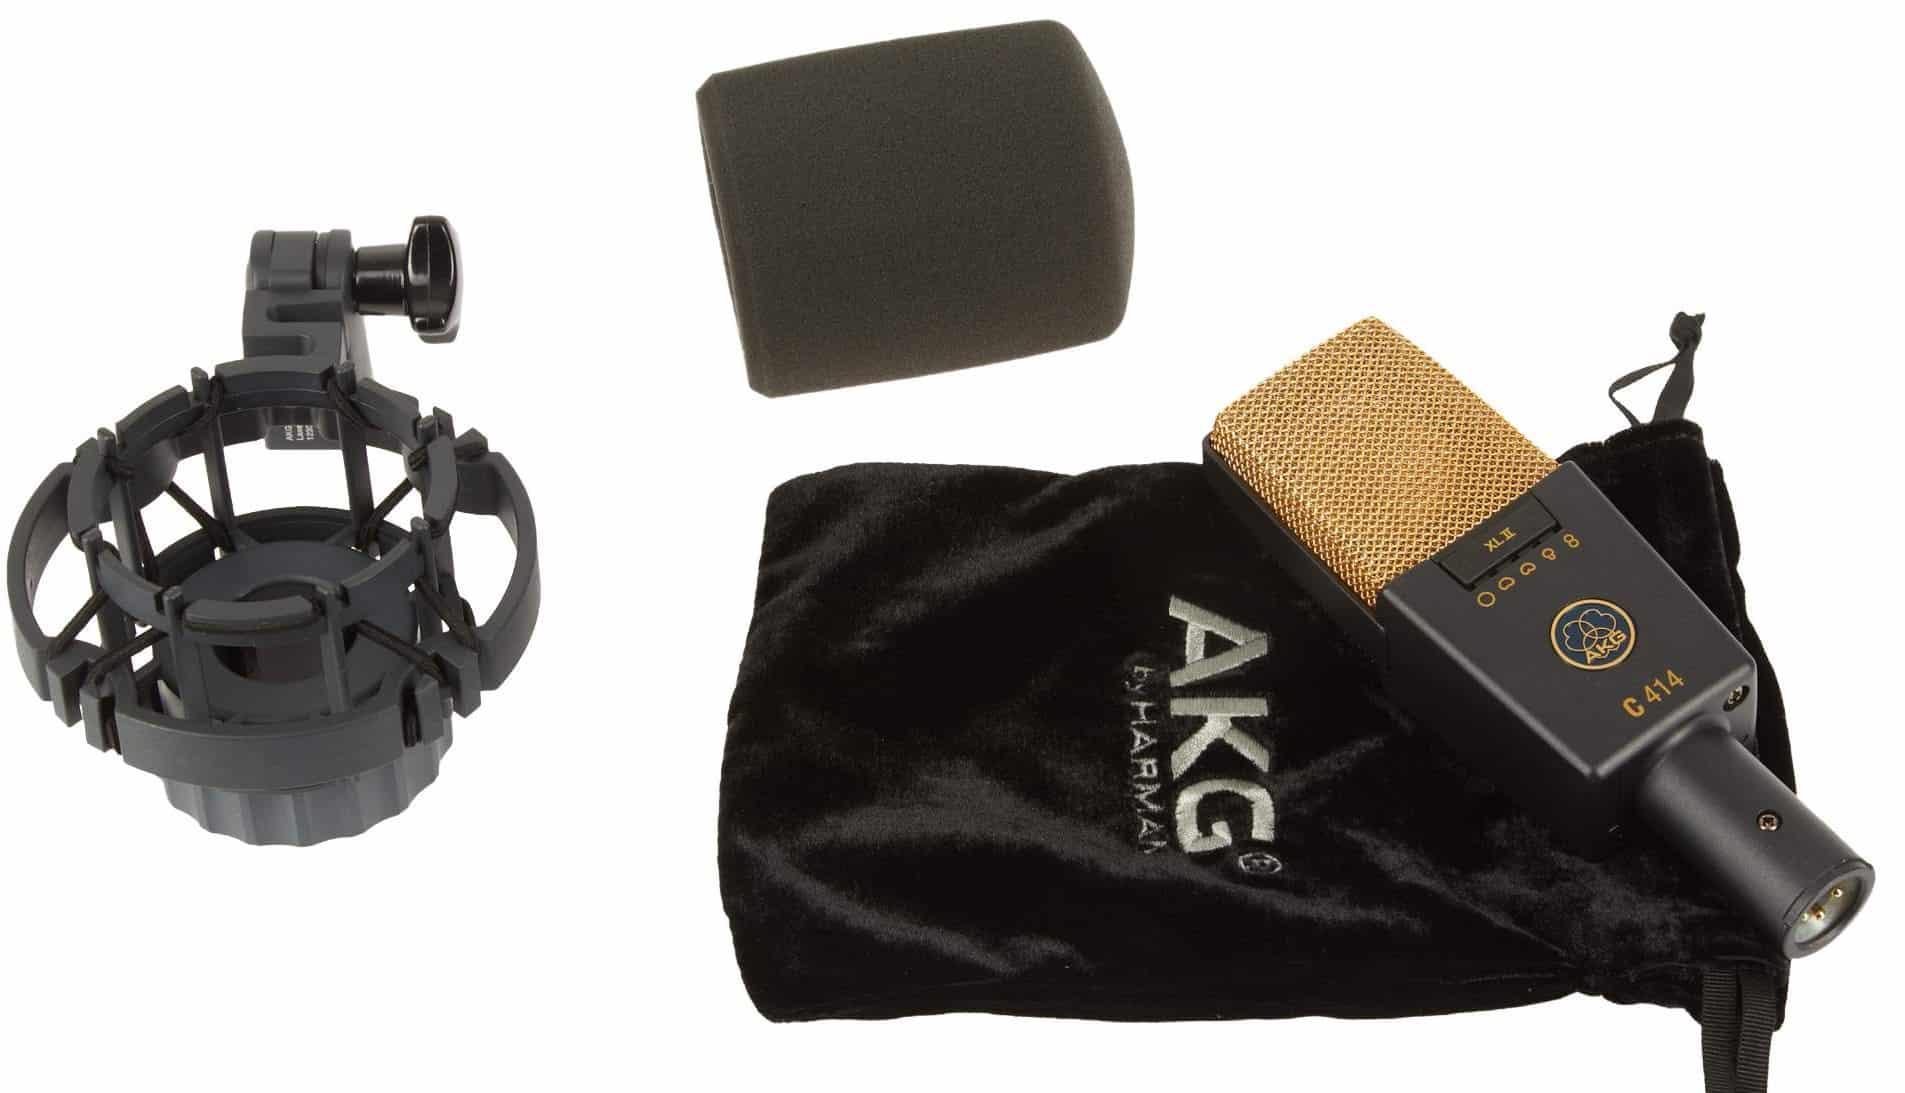 Pack C414 XLII